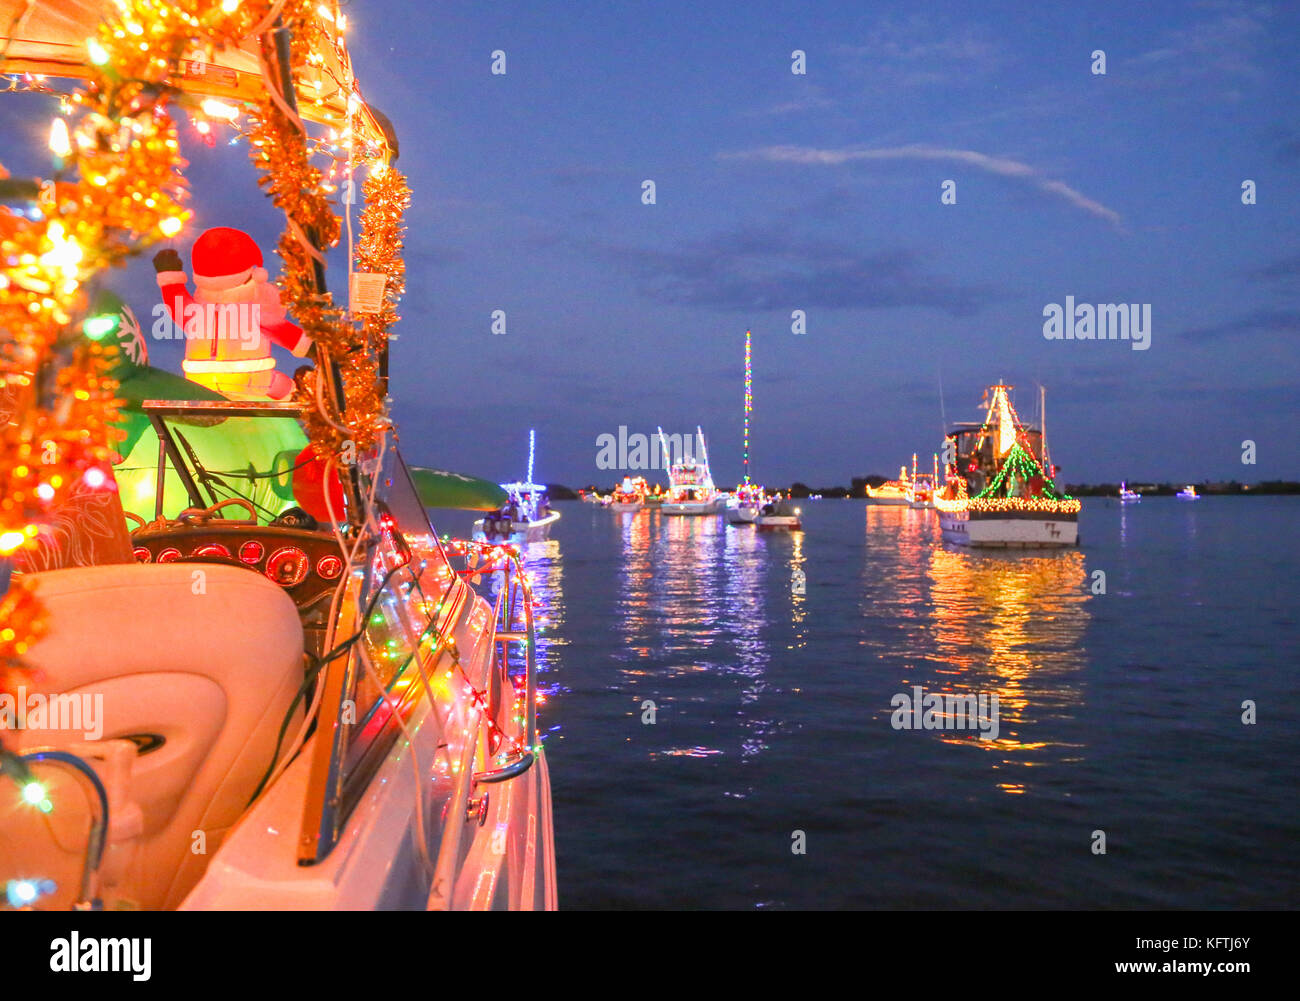 Christmas Boat Parade Stock Photos & Christmas Boat Parade Stock ...